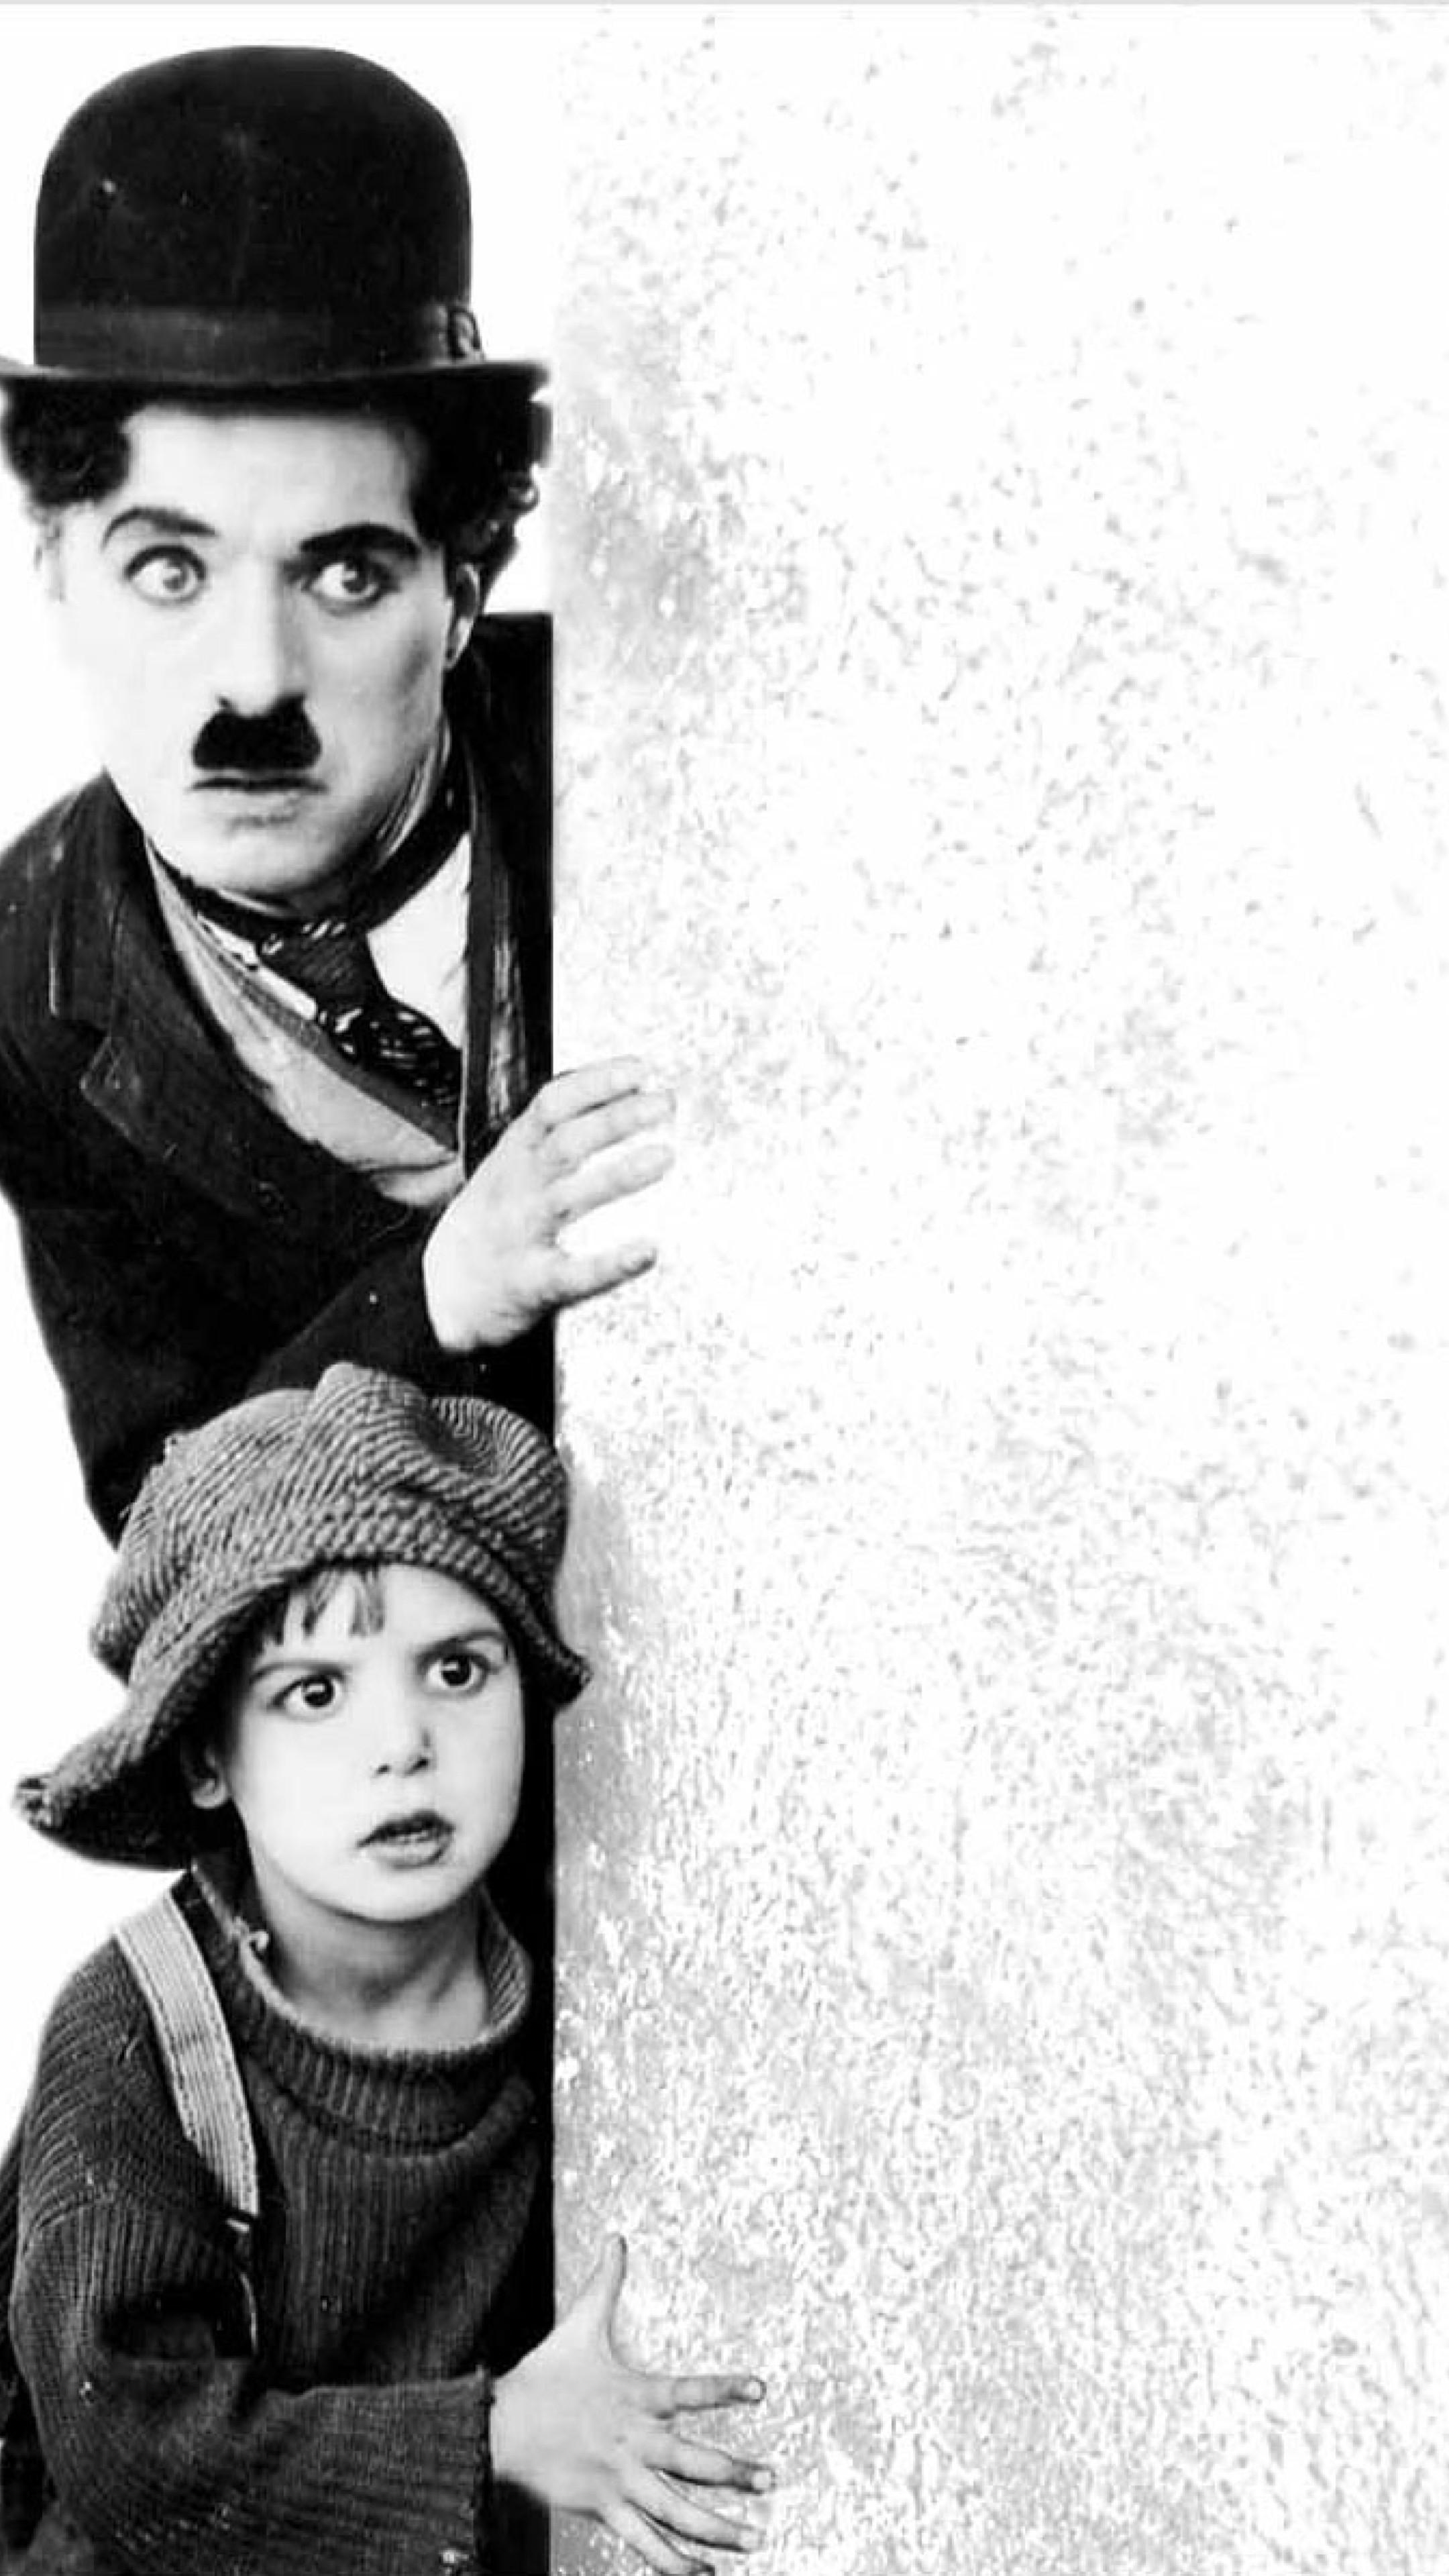 58 Charlie Chaplin Wallpapers on WallpaperPlay 2160x3839